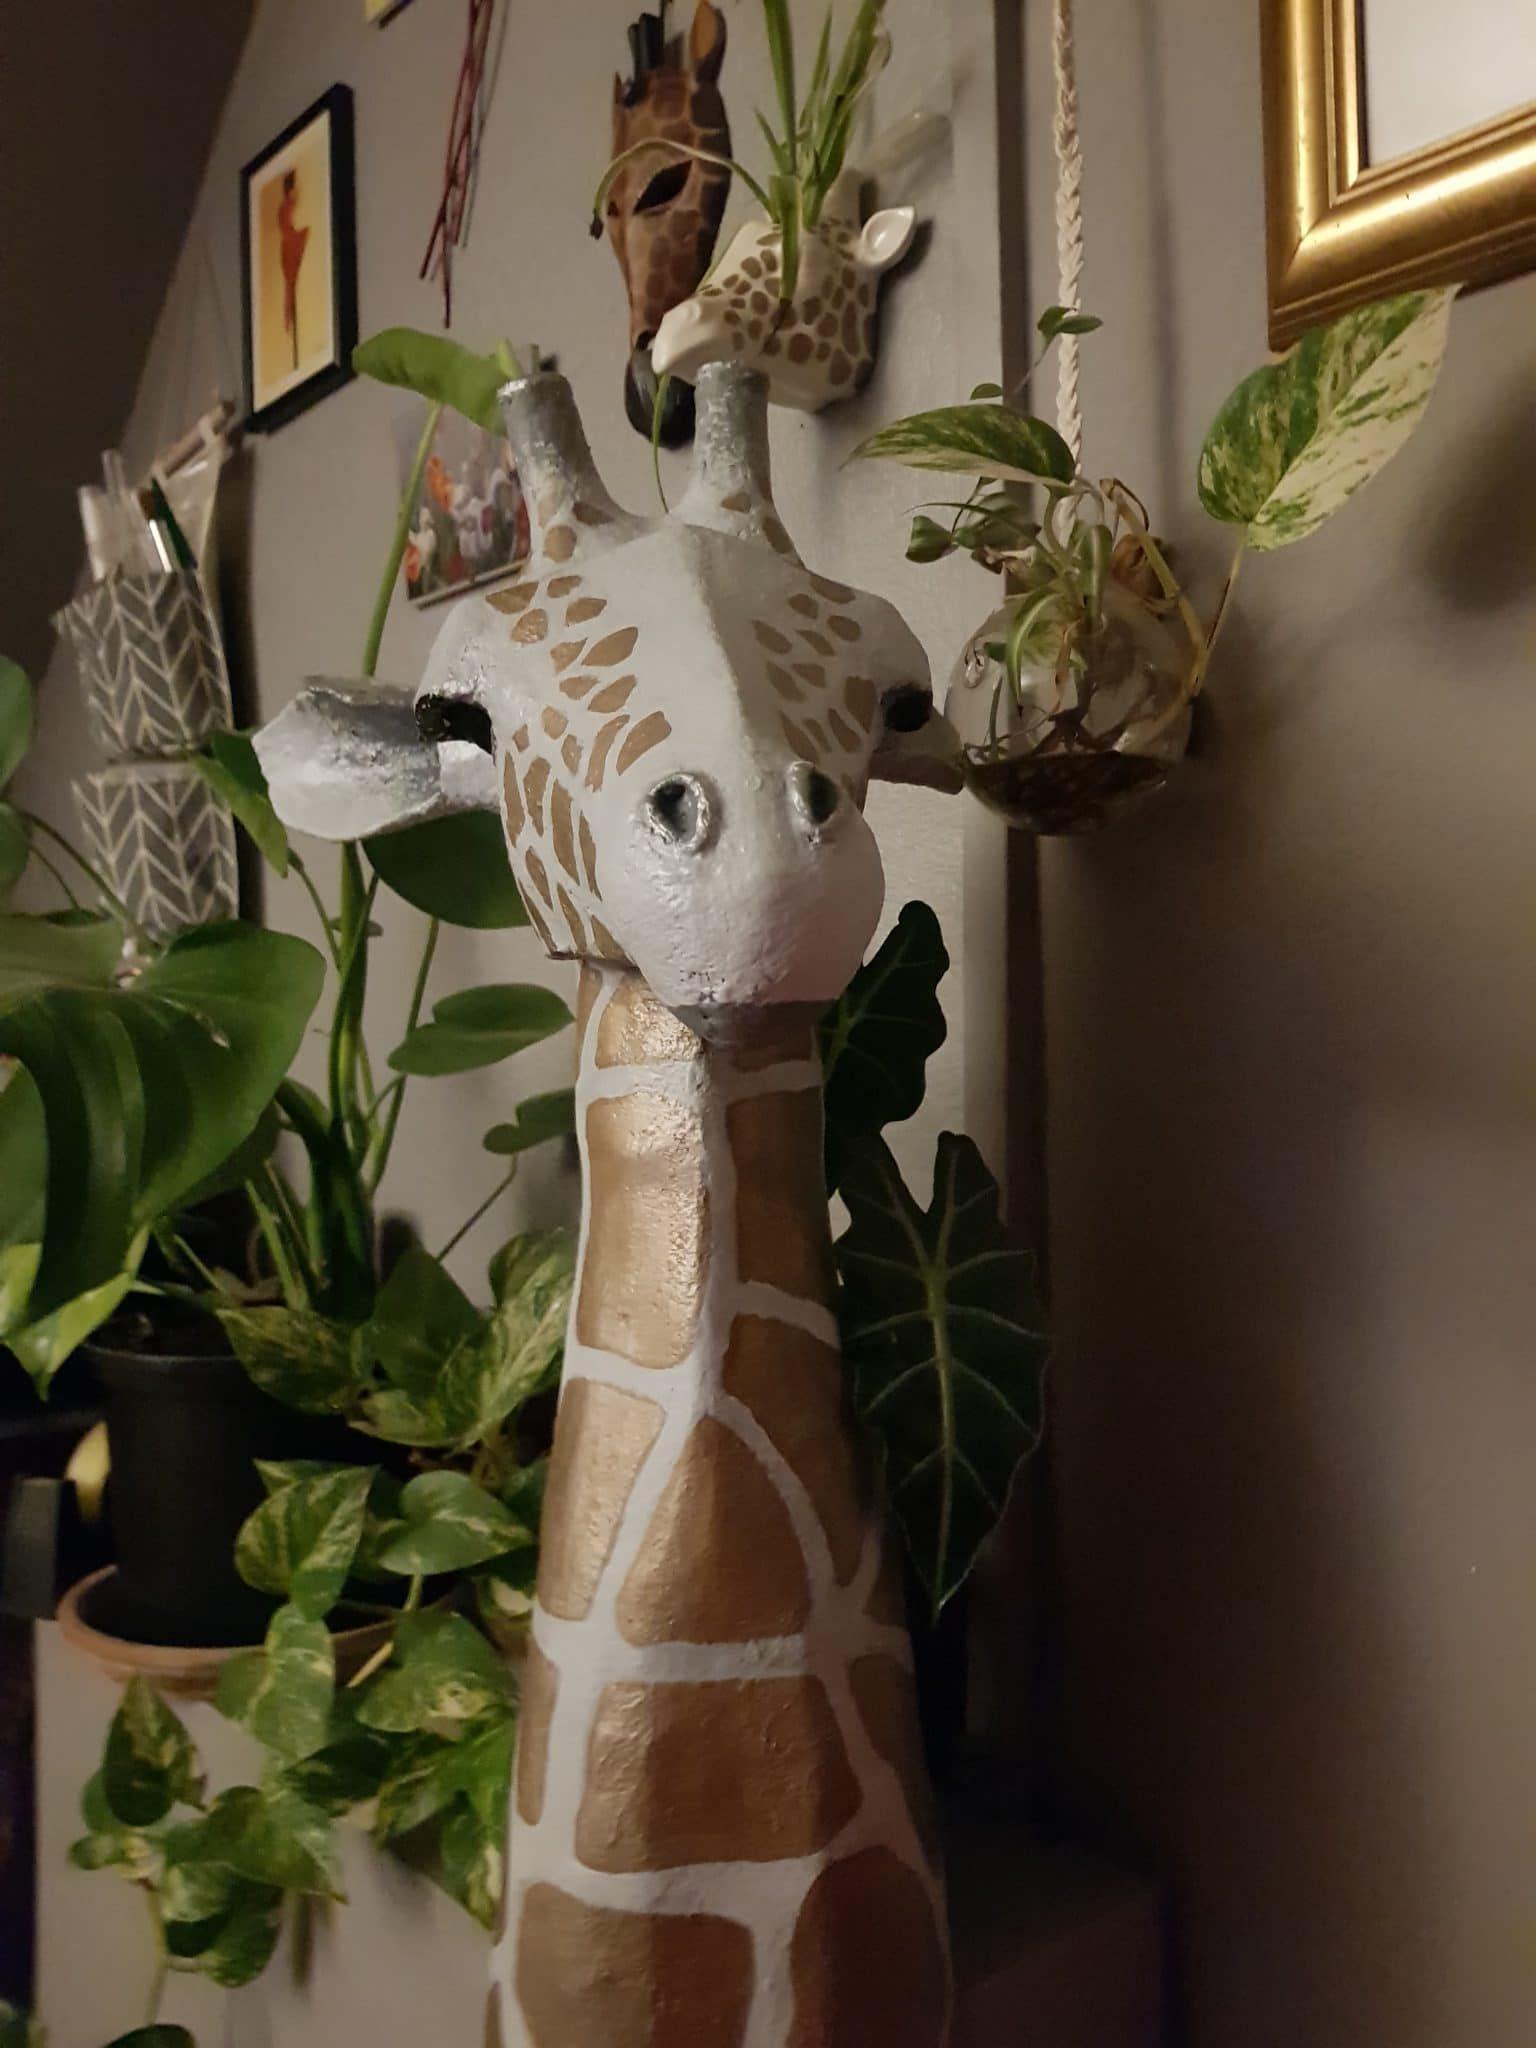 Giraffe head sculpture by Louise Keegan